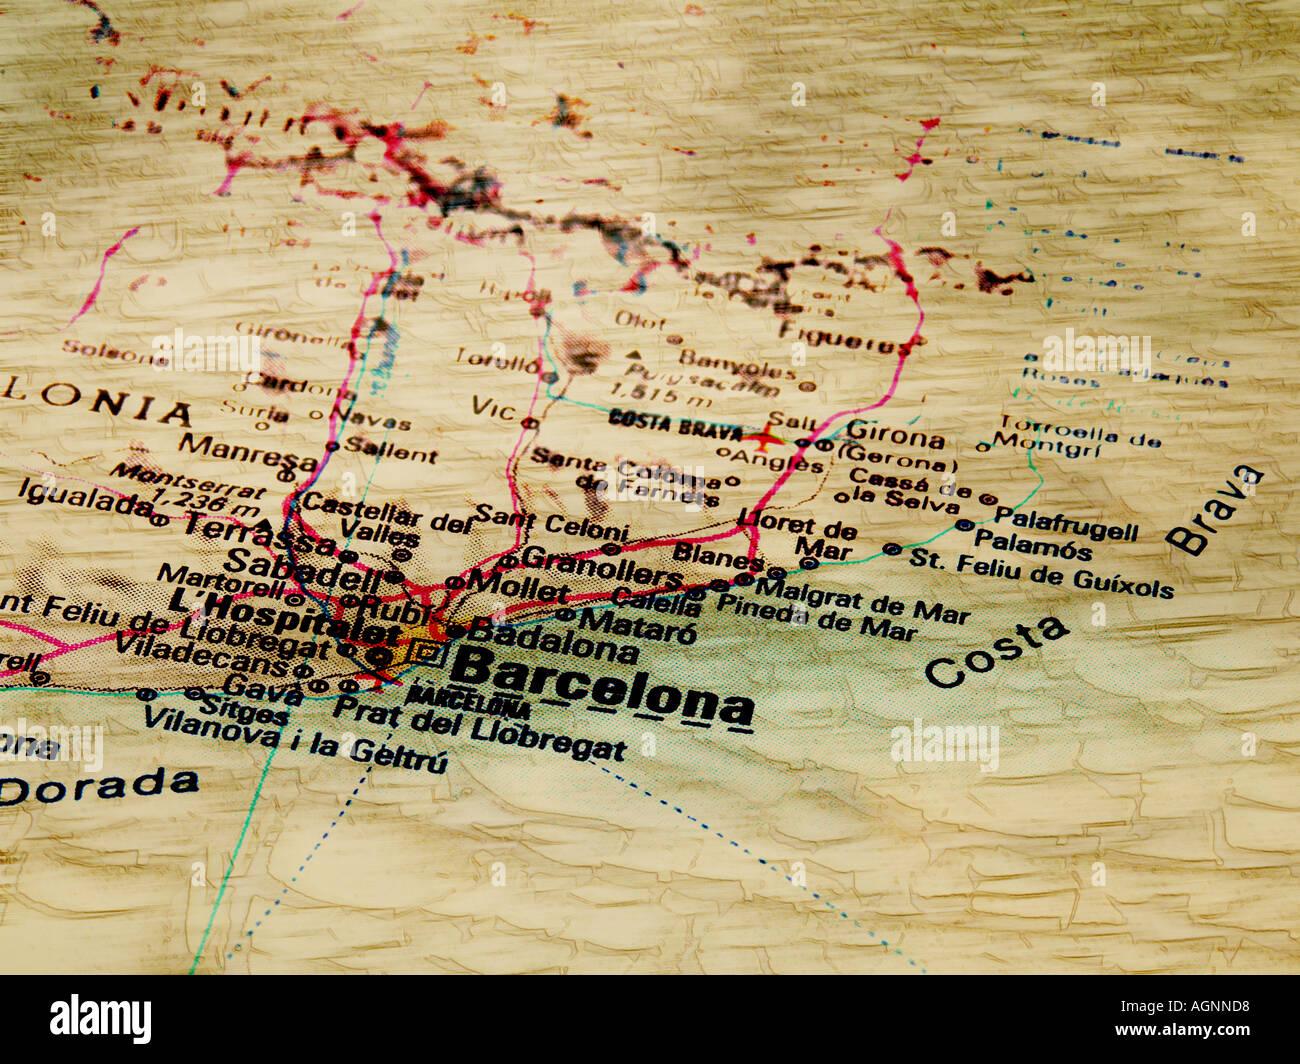 Antique Looking Map Barcelona Stock Photos Antique Looking Map - Antique looking maps